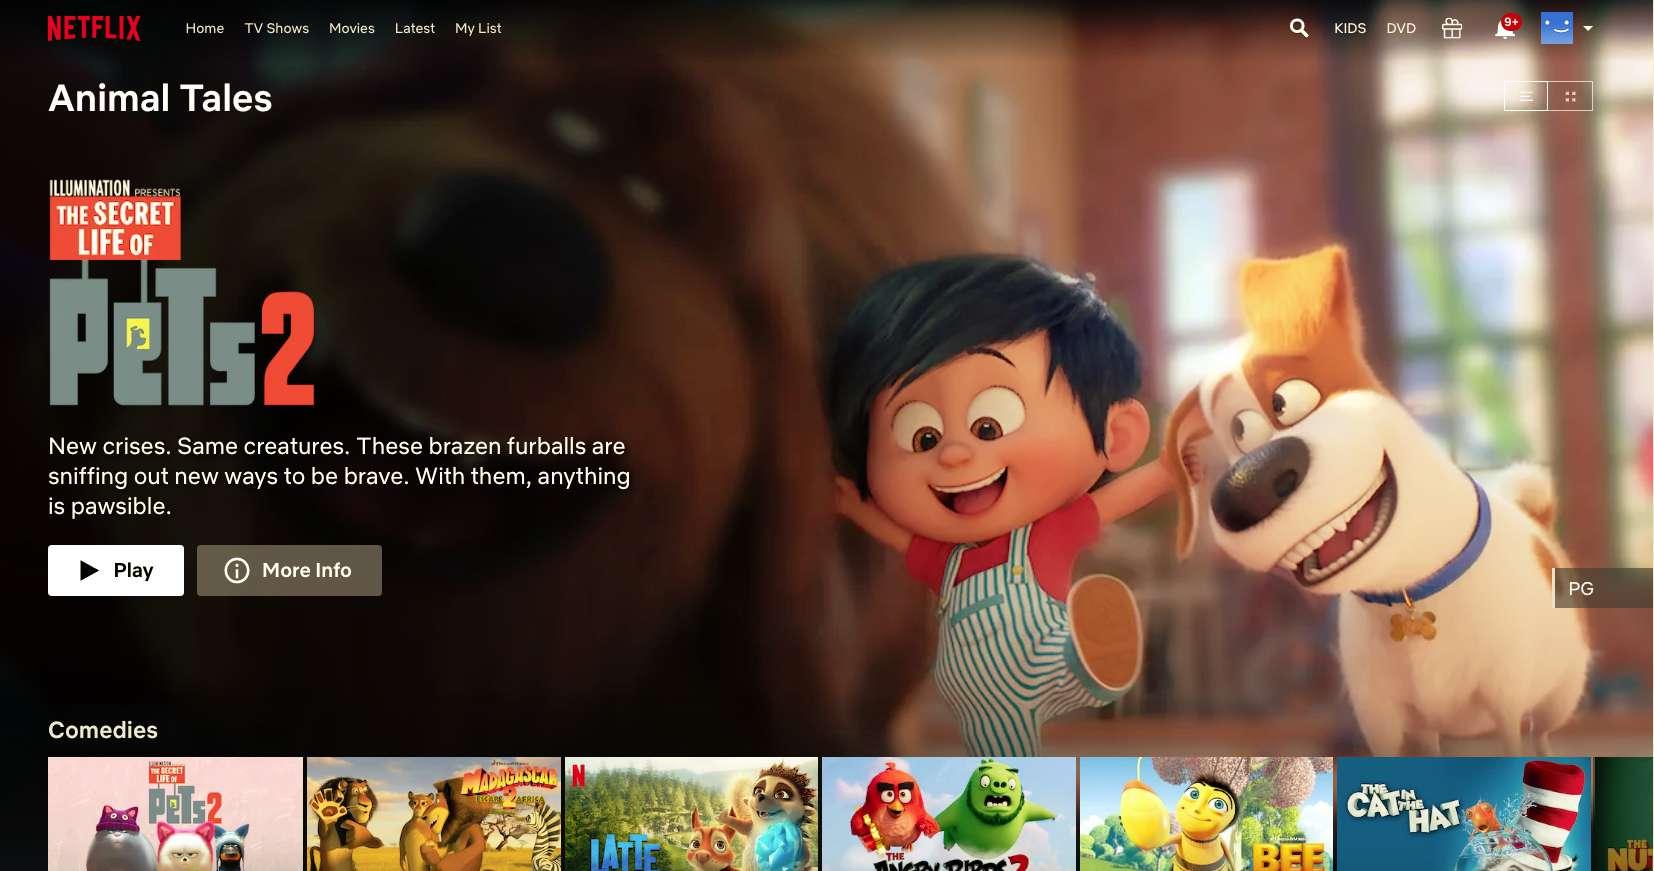 Netflix secret code for kids' movies like Secret Life of Pets 2